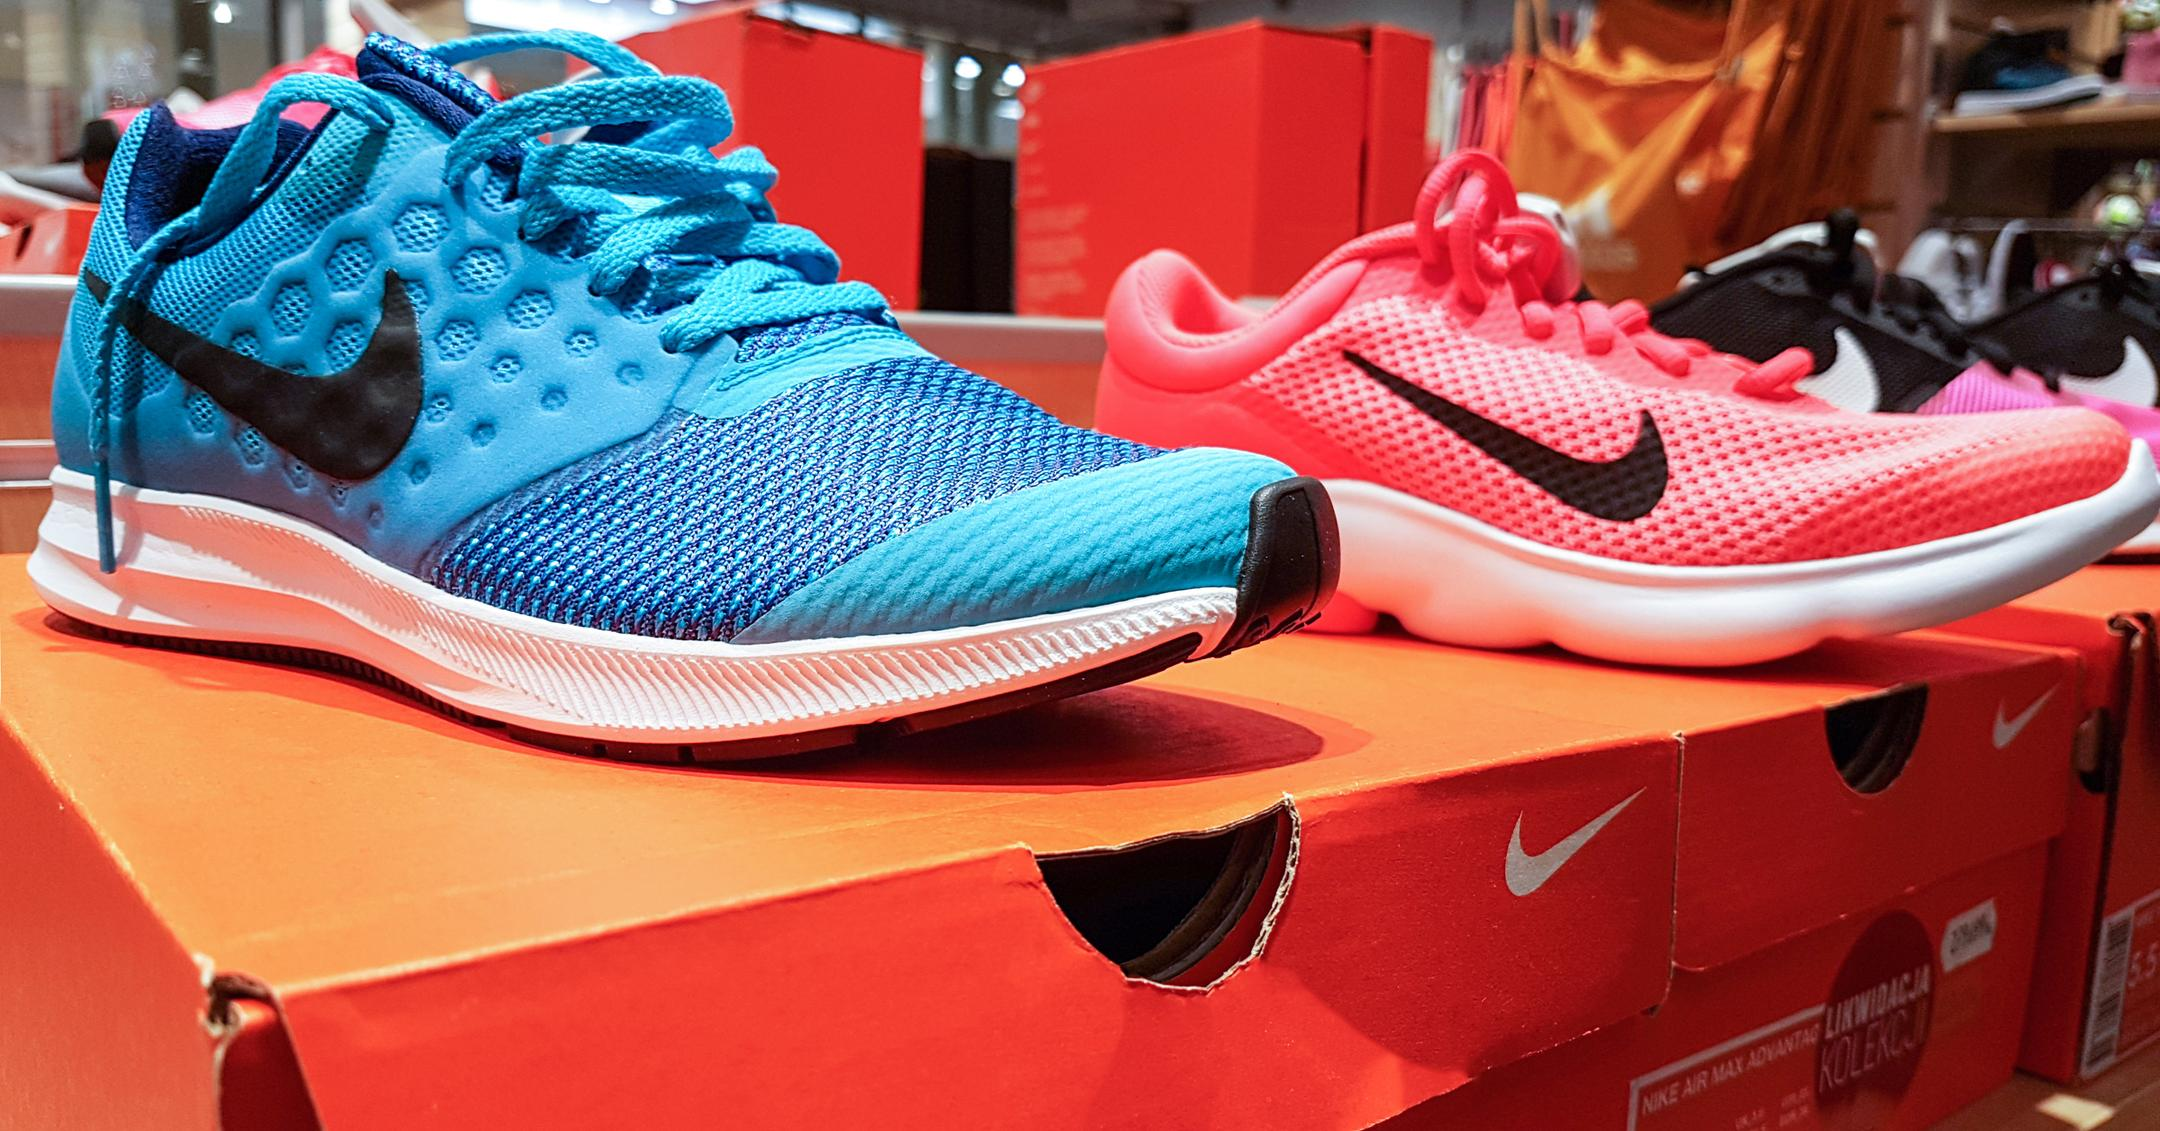 riñones Impedir Reparación posible  Nike Manufacturing and Supply Chain Strategies